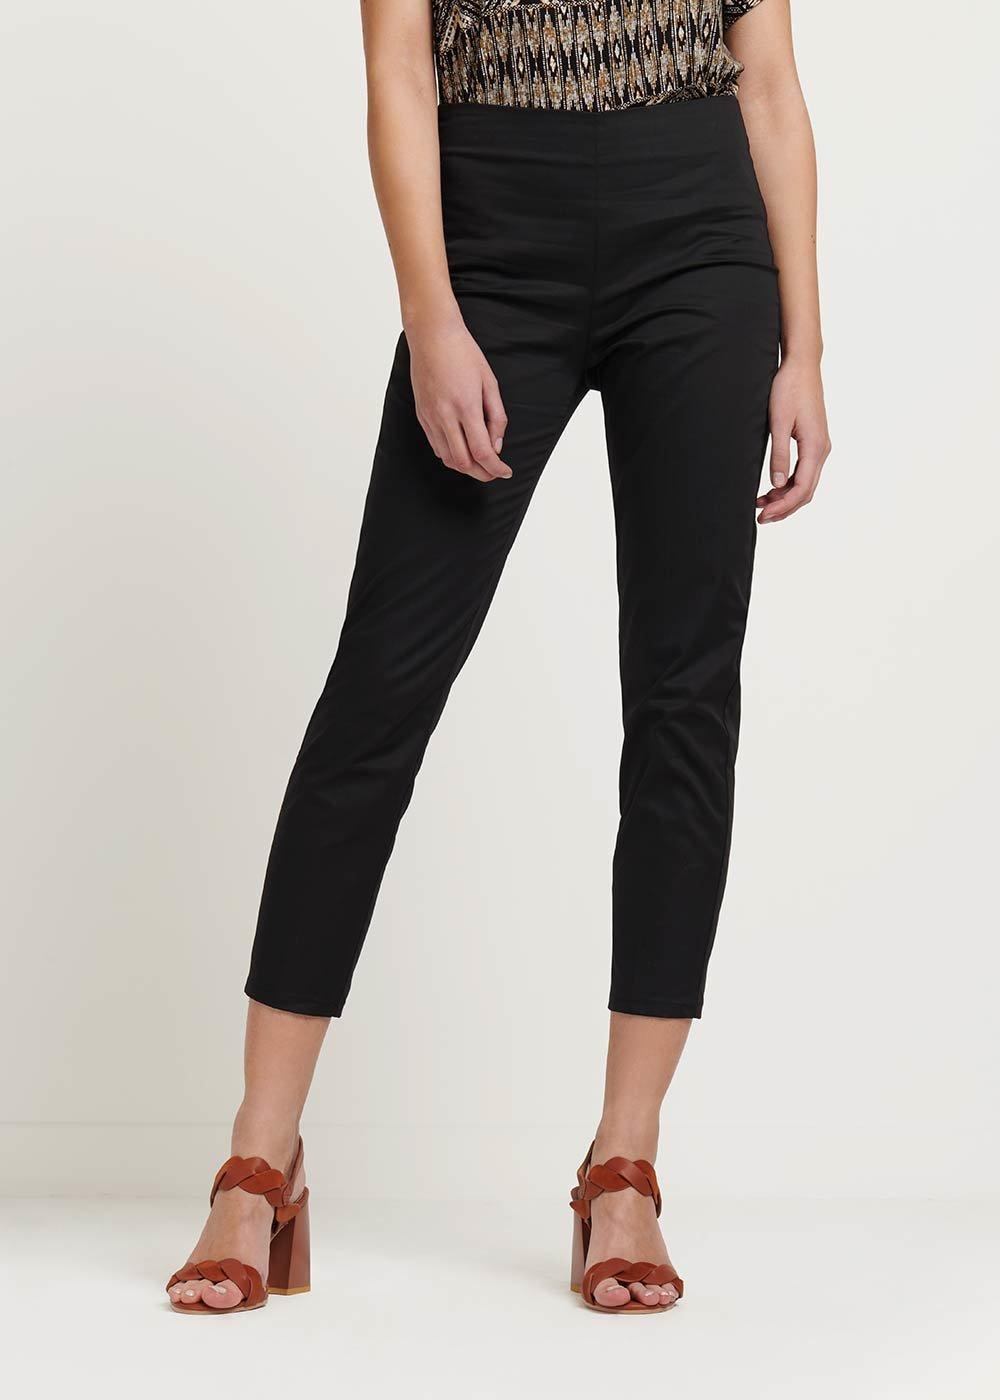 Claudia capri pants with side zipper - Black - Woman